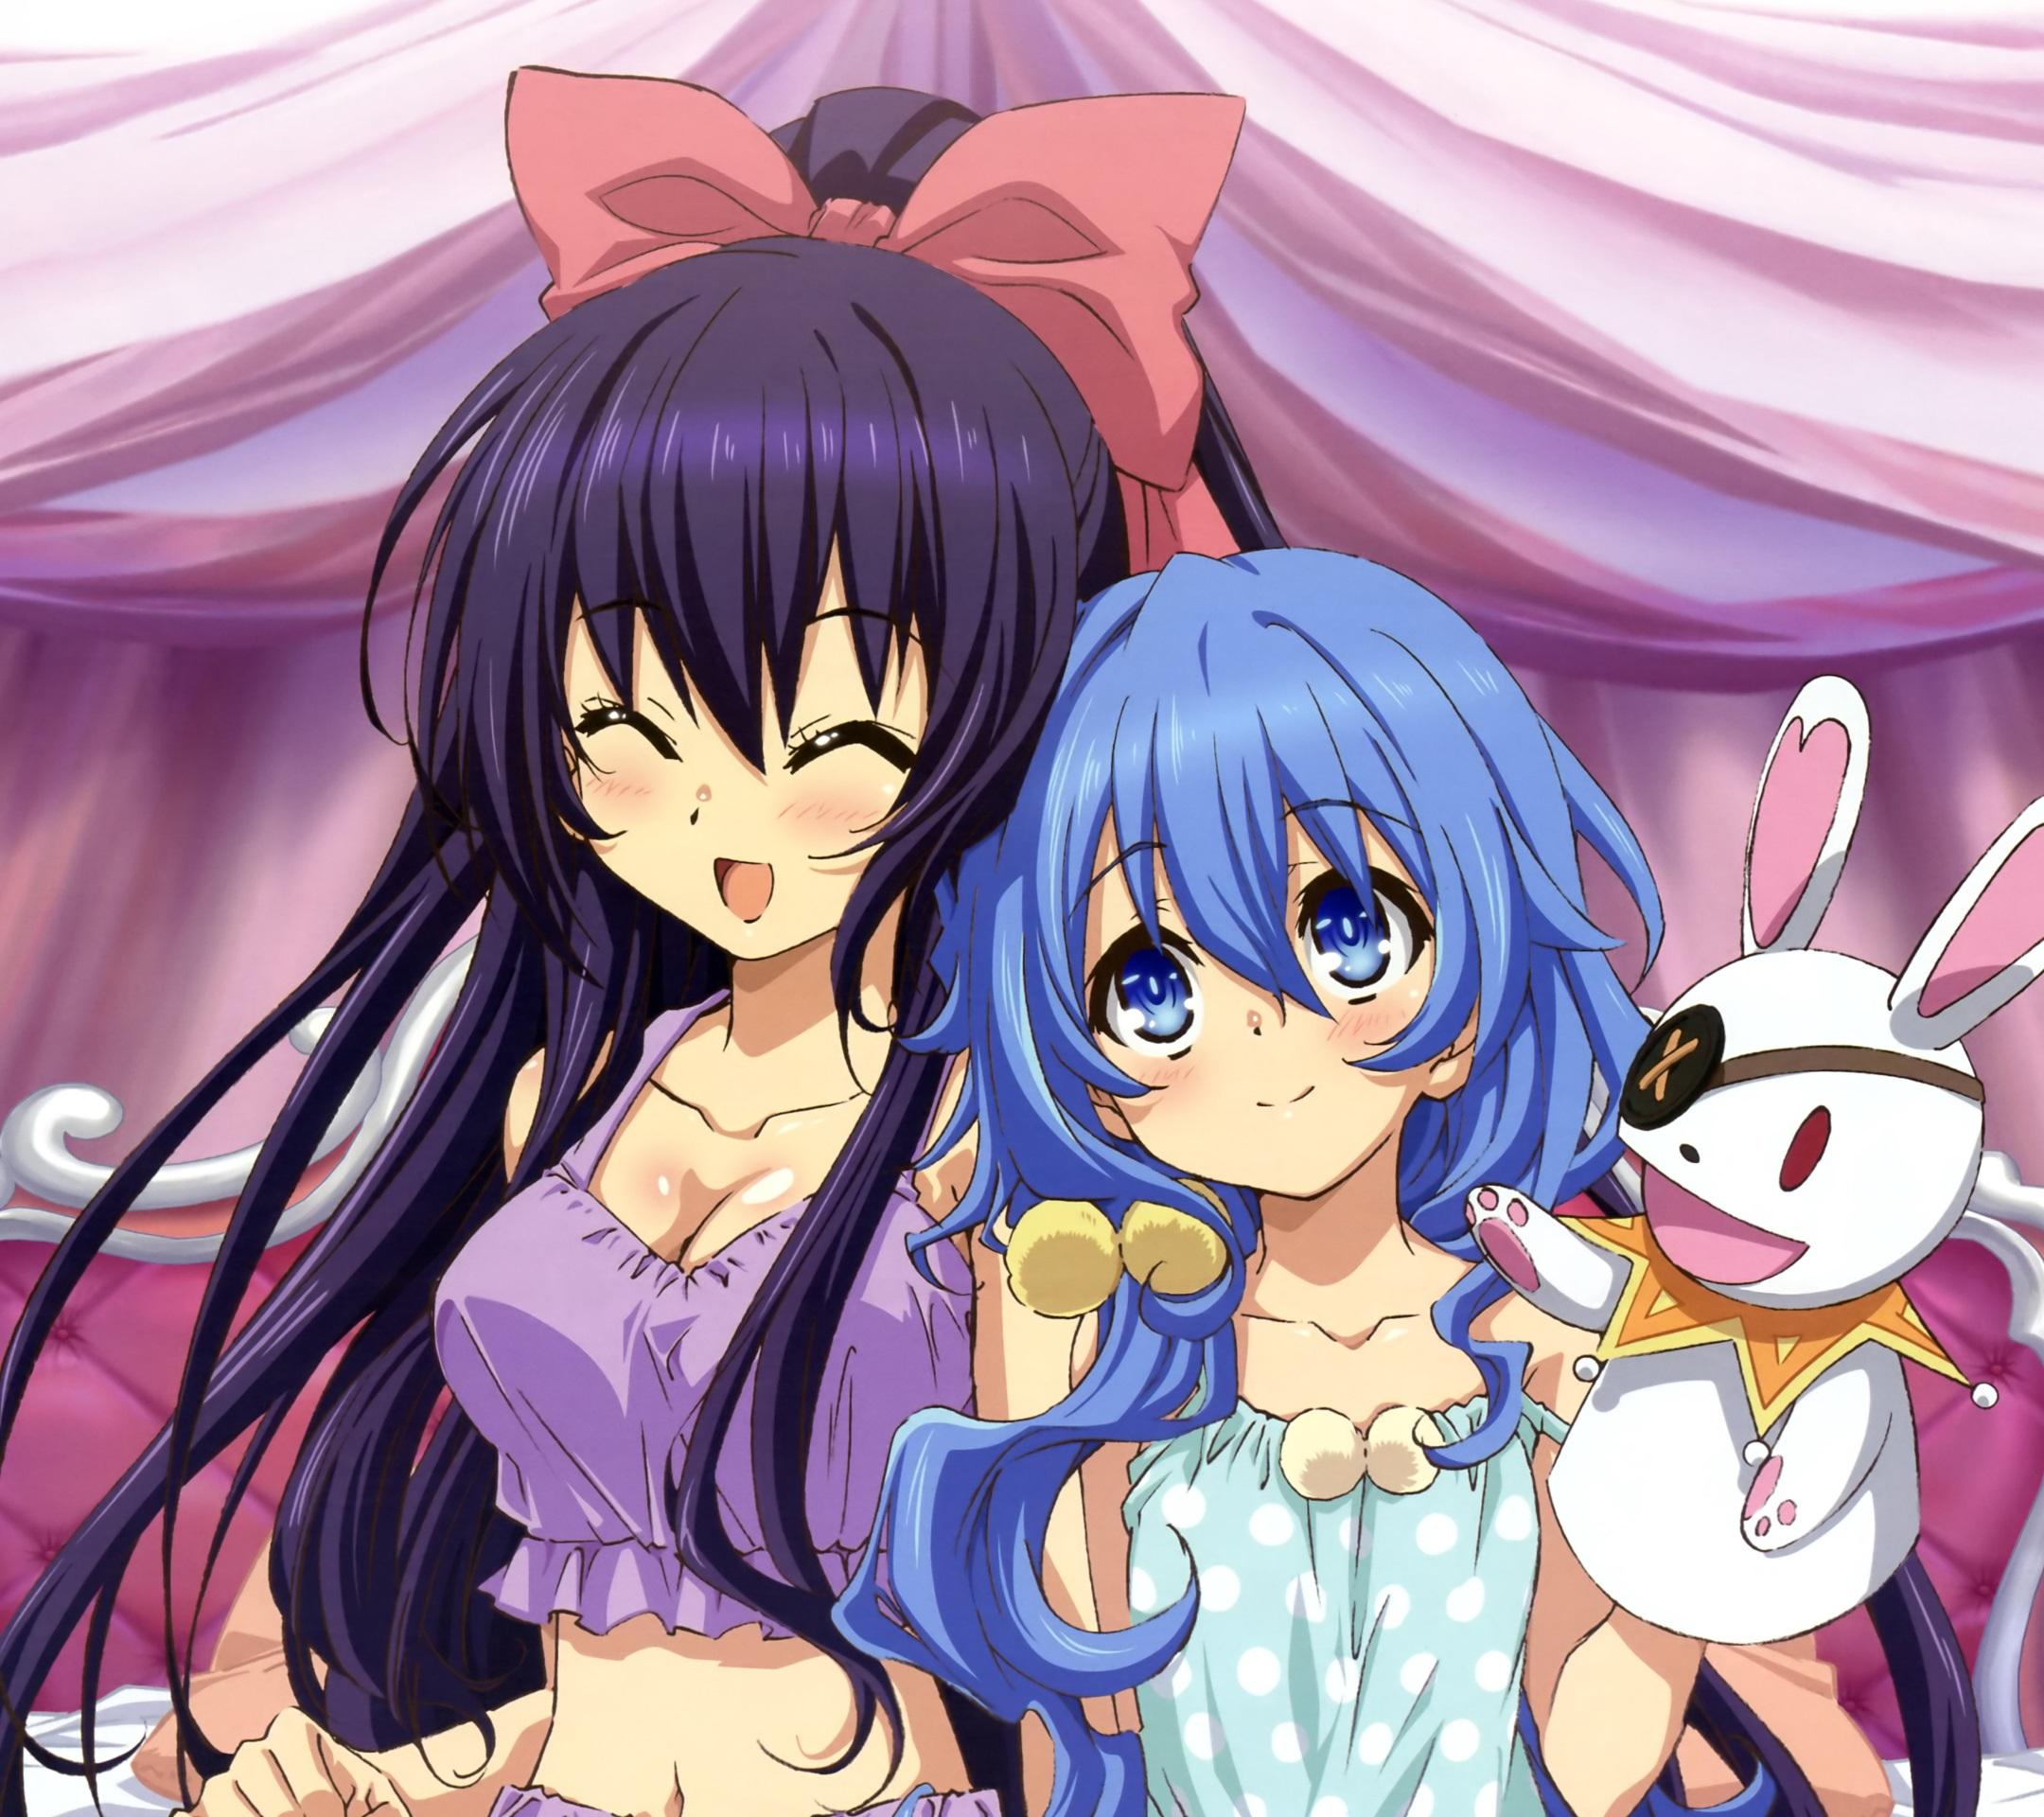 Anime Wallpaper Live: Date A Live 2 Wallpaper